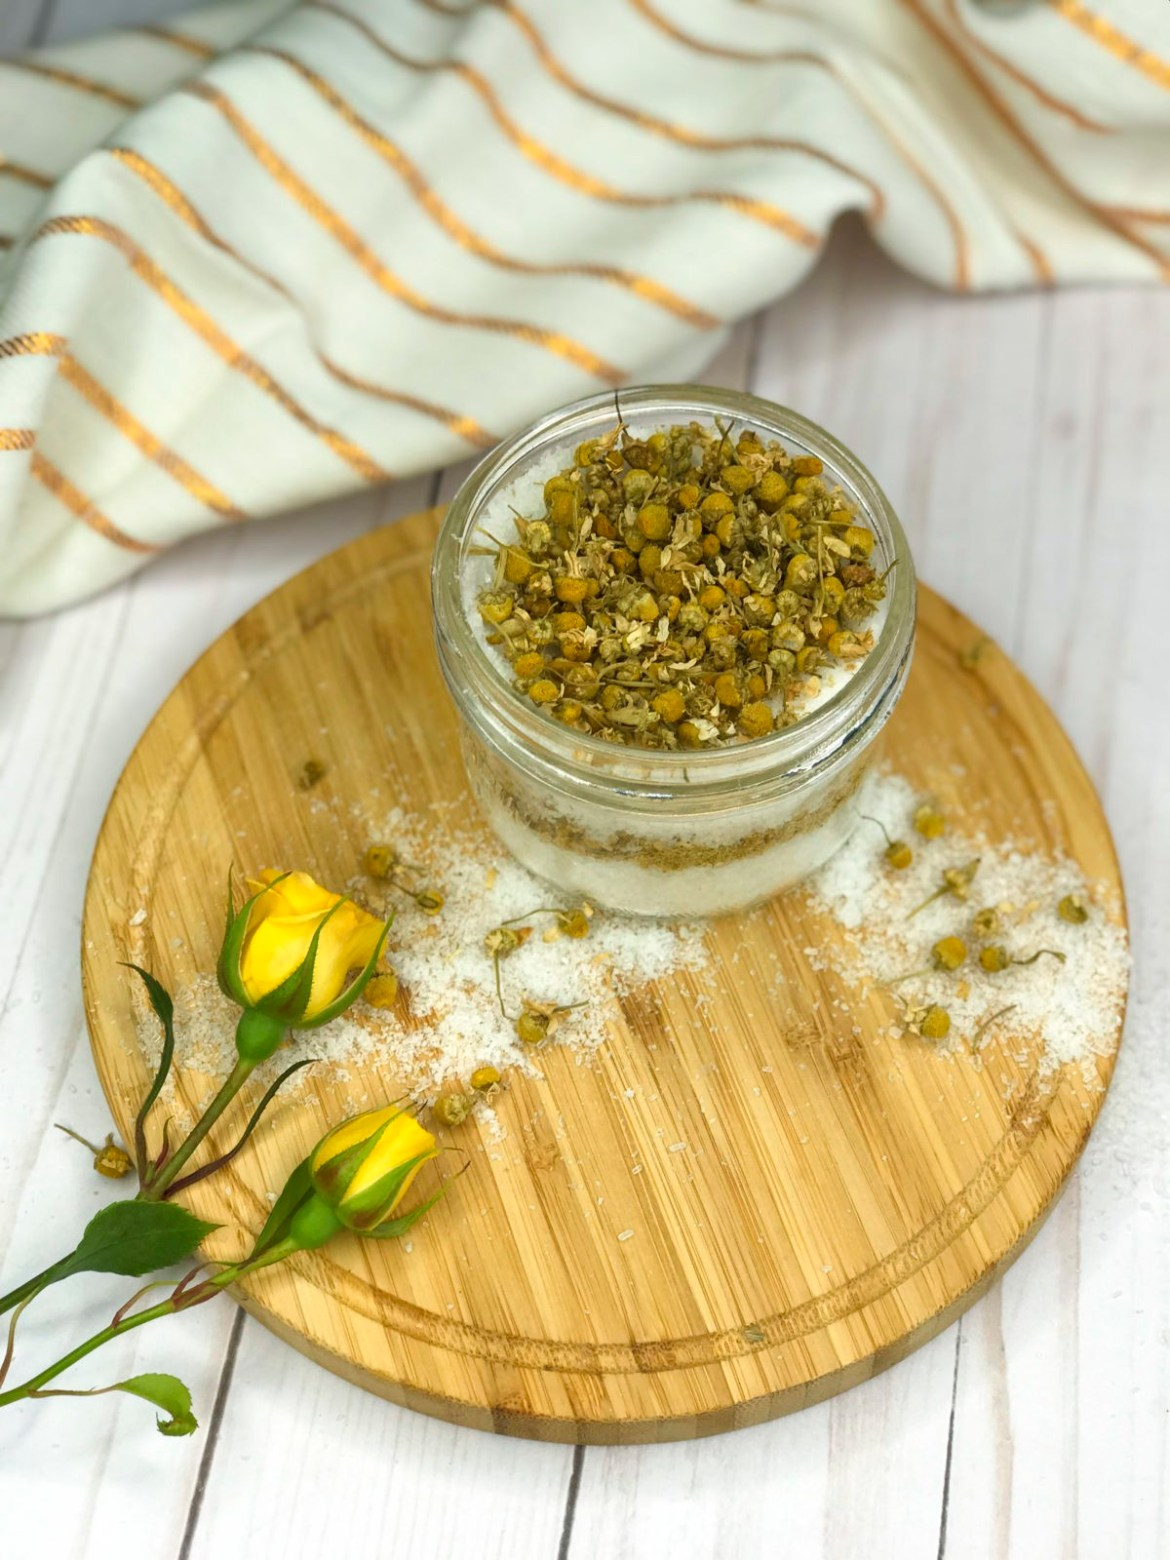 Self-Care with DIY Bath Salts